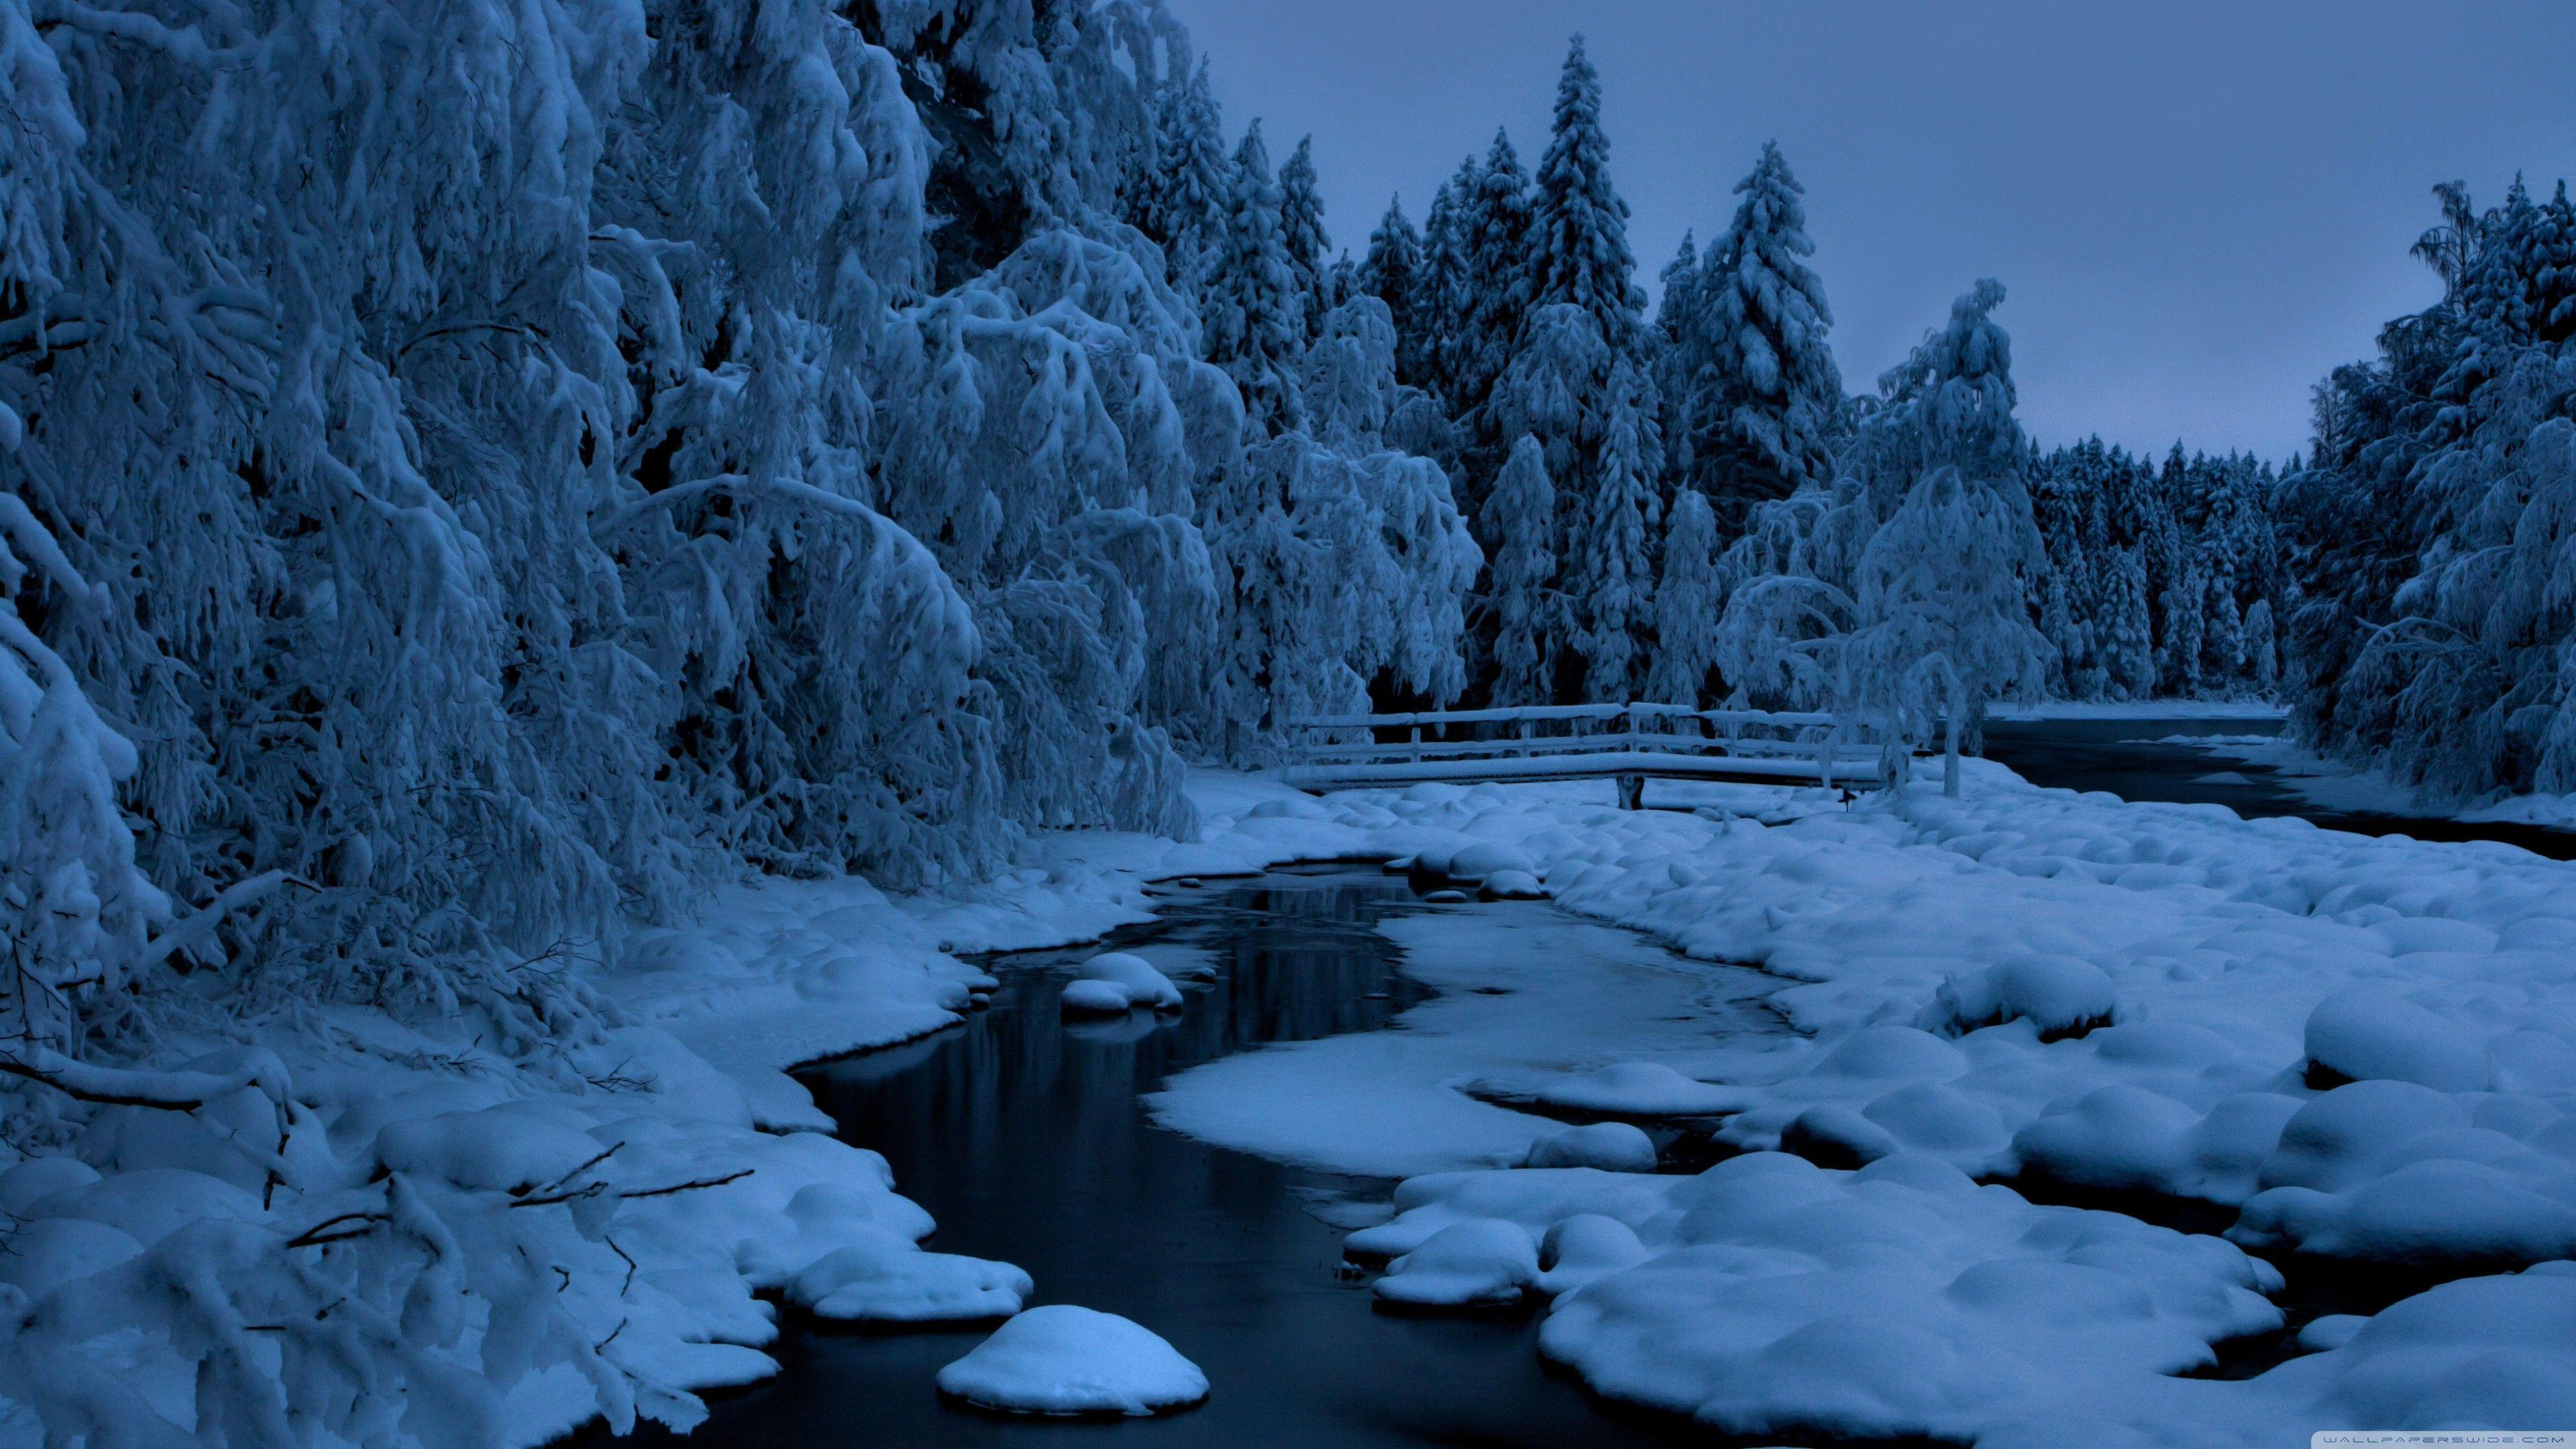 Snow Desktop Wallpapers Top Free Snow Desktop Backgrounds Wallpaperaccess